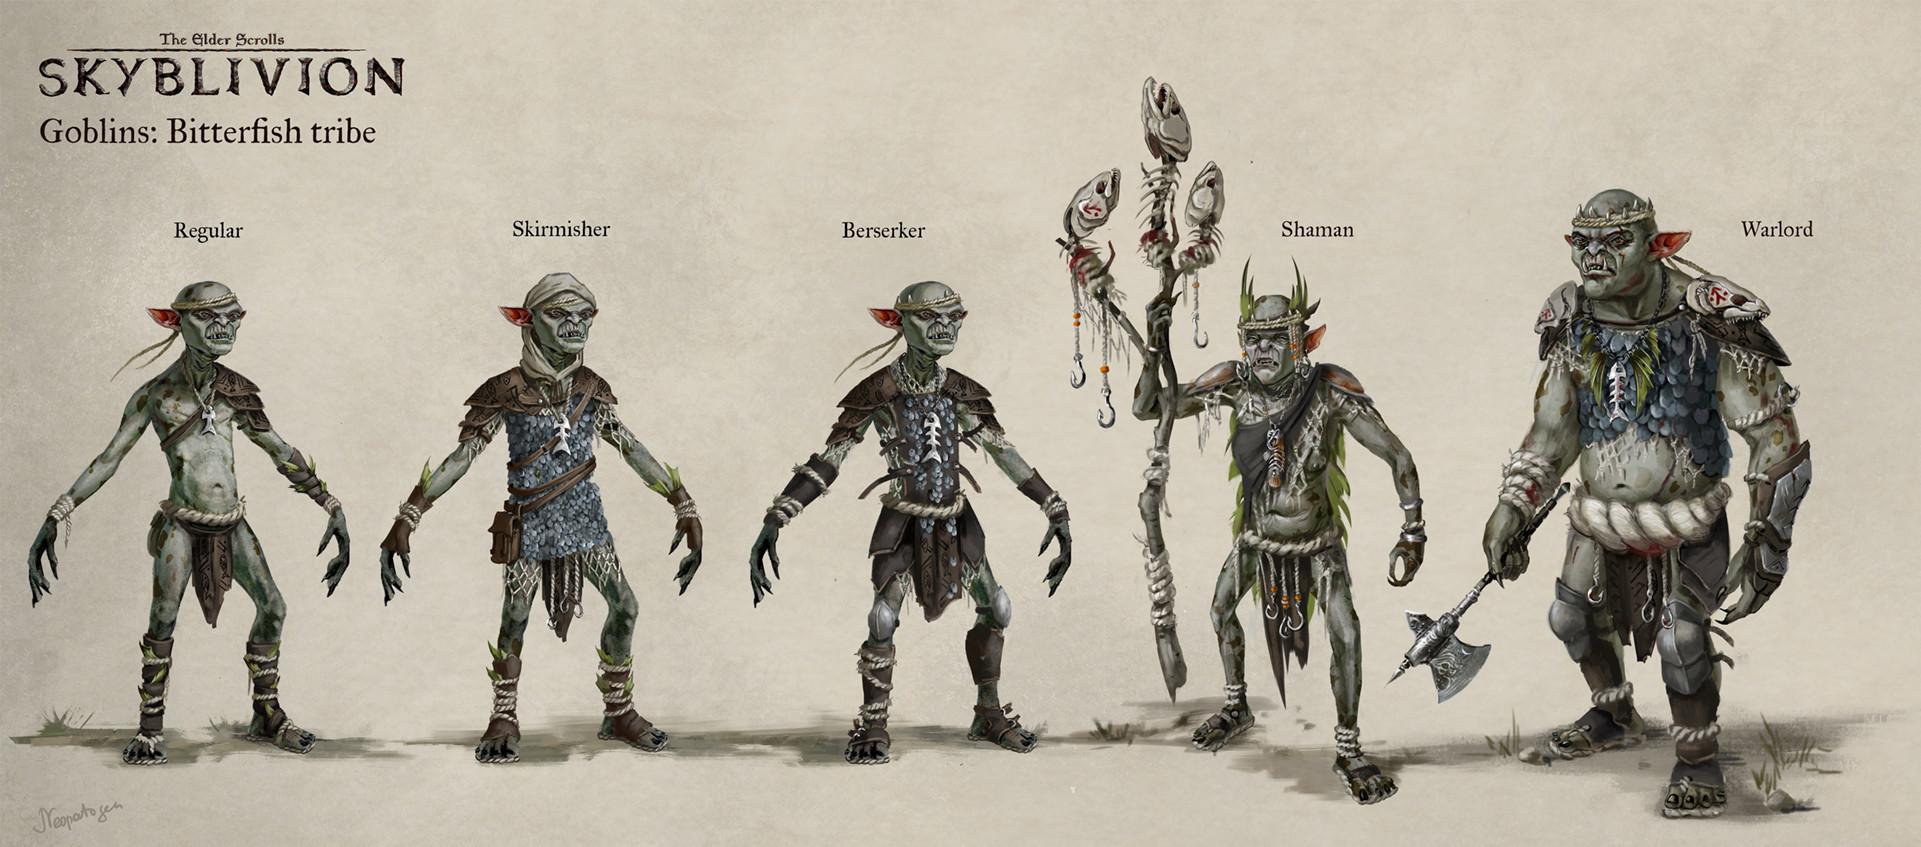 Goblins: Bitterfish Tribe